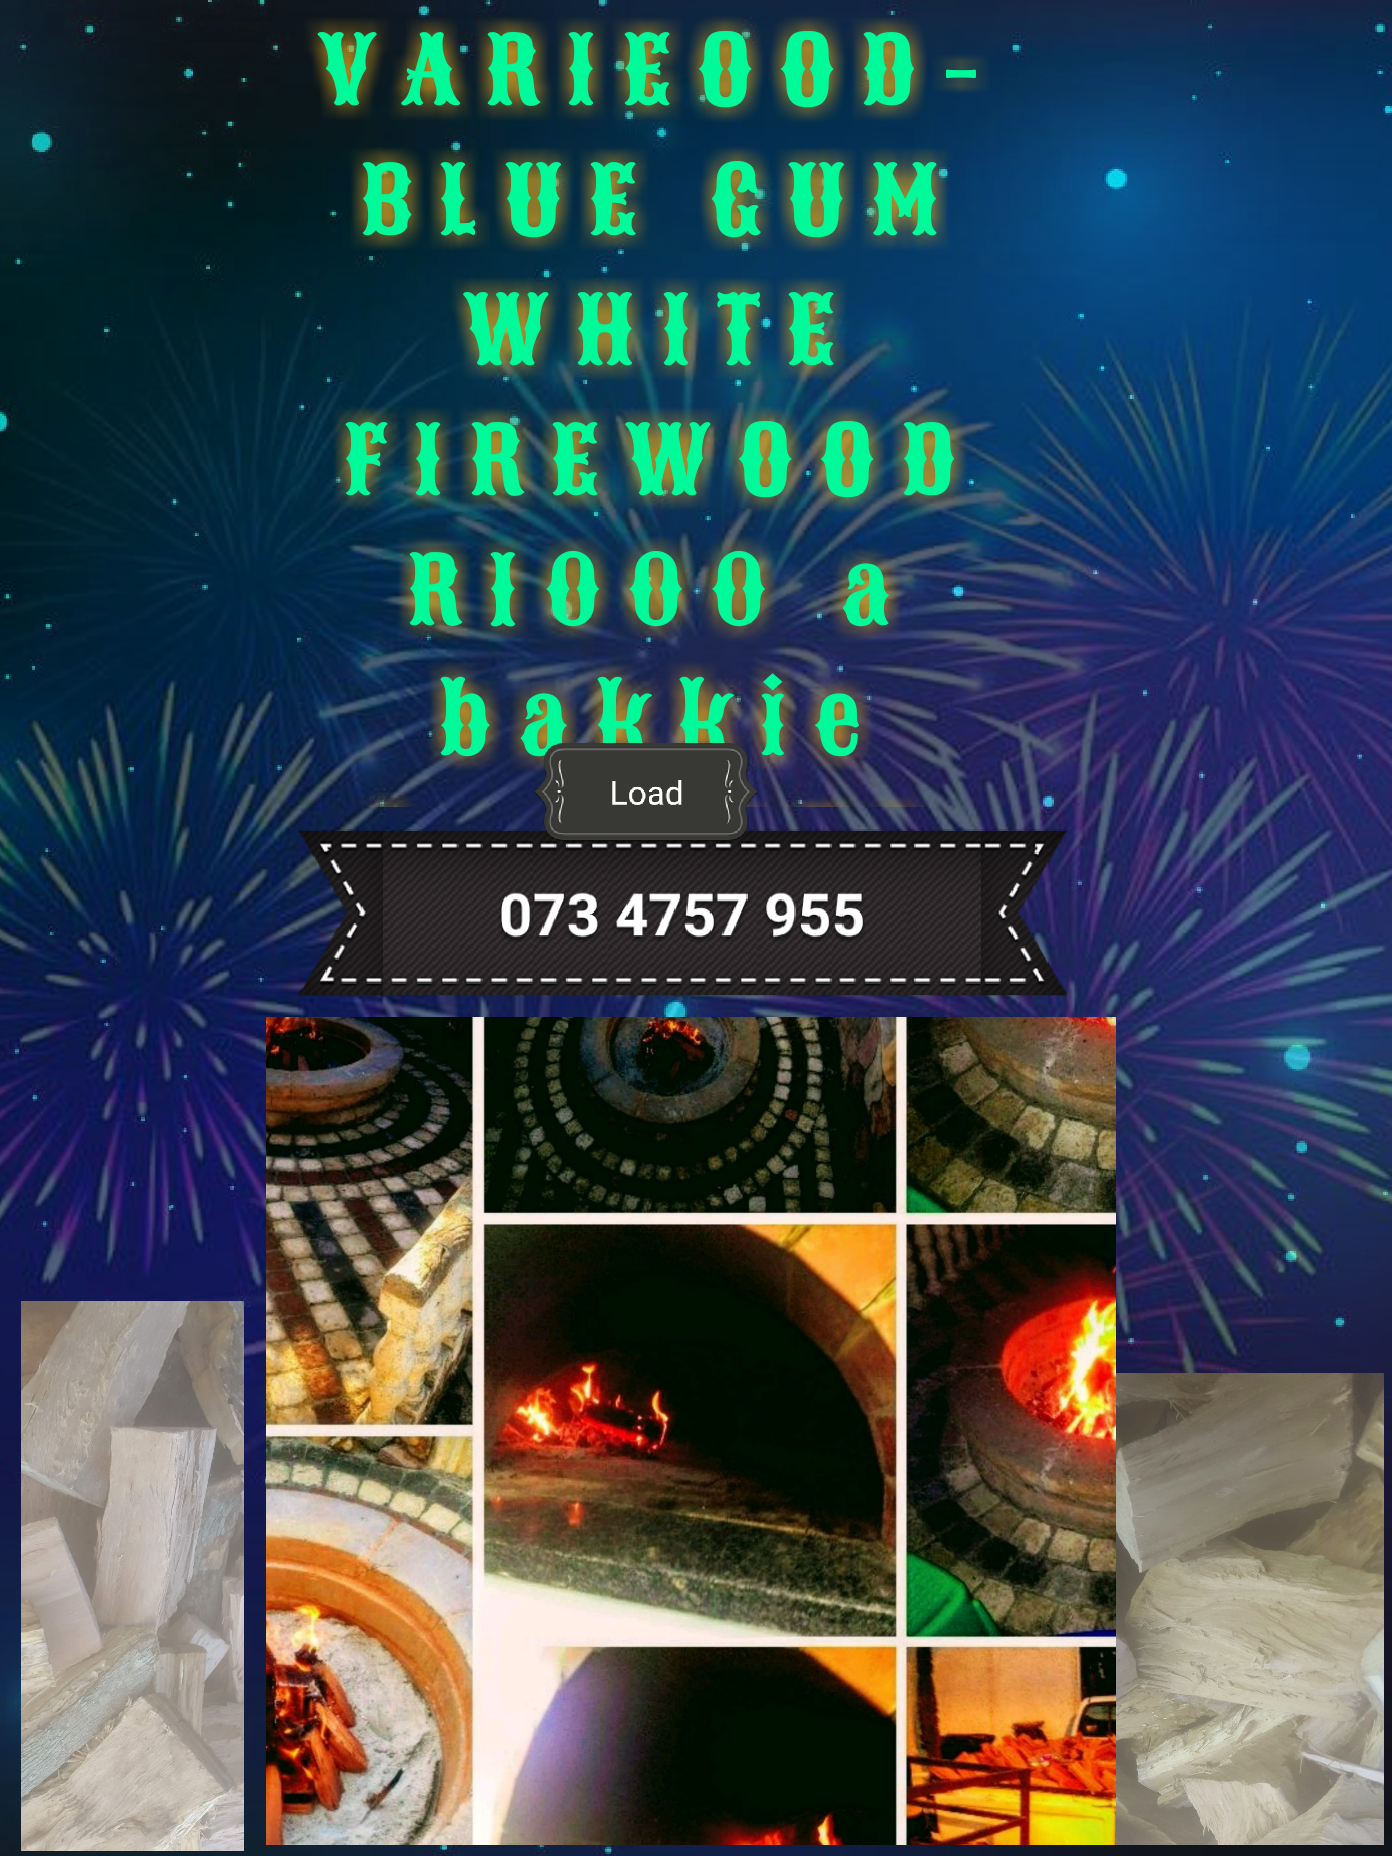 BLUE GUM FIREWOOD for sale bakkie load R1000 free delivery